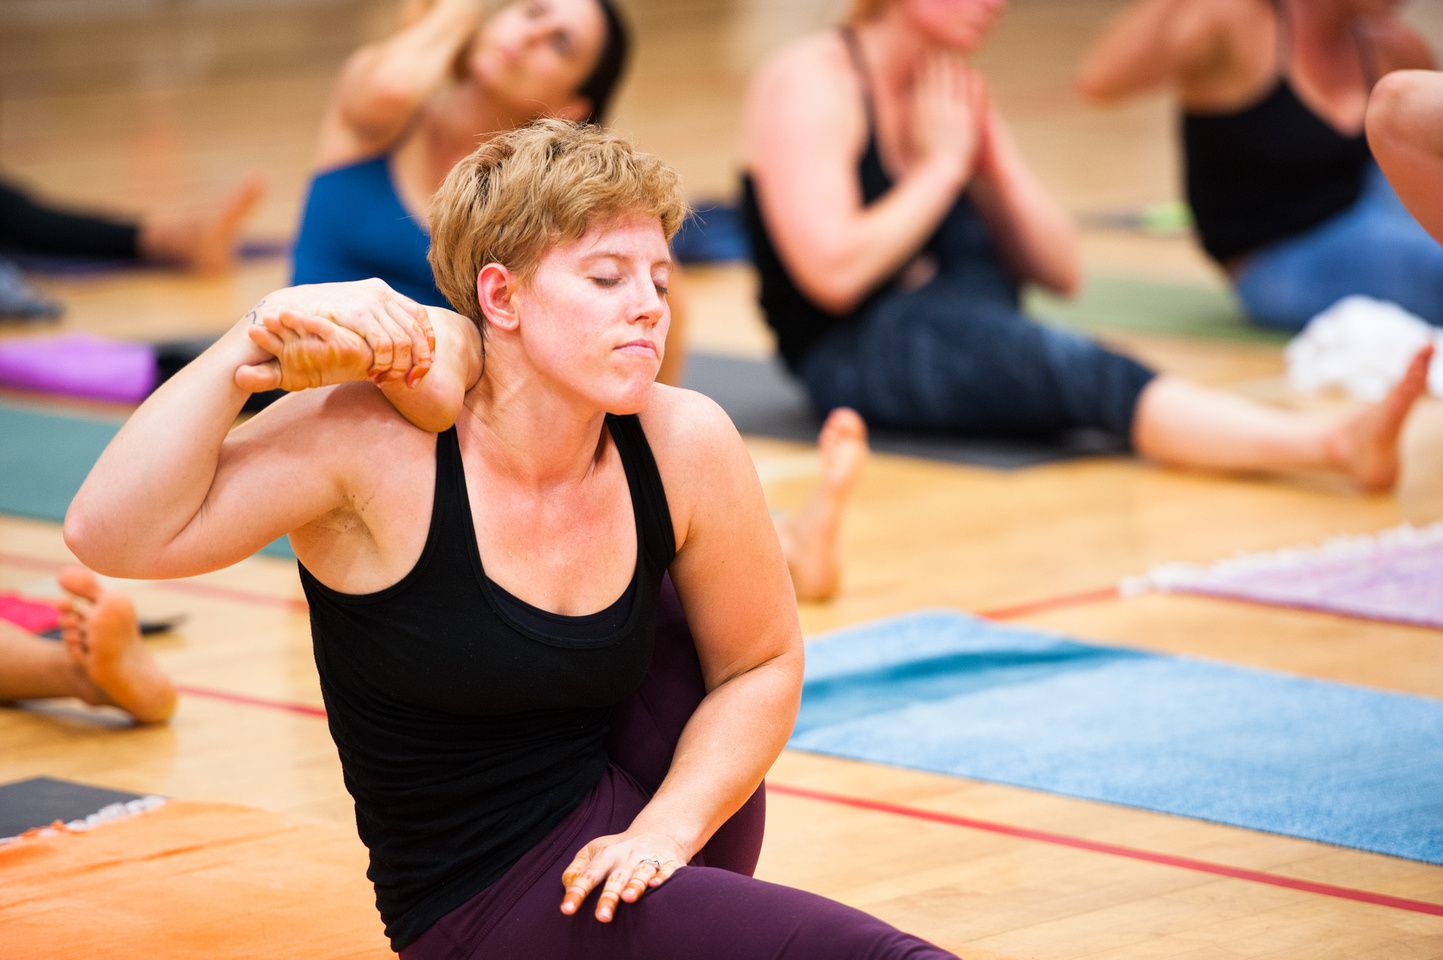 Meghan Mccullough Kirk Teacher At Dhyanayoga In Phl Ashtanga Yoga Nyc Sharath Yoga Tour Ashtanga Yoga Yoga Articles